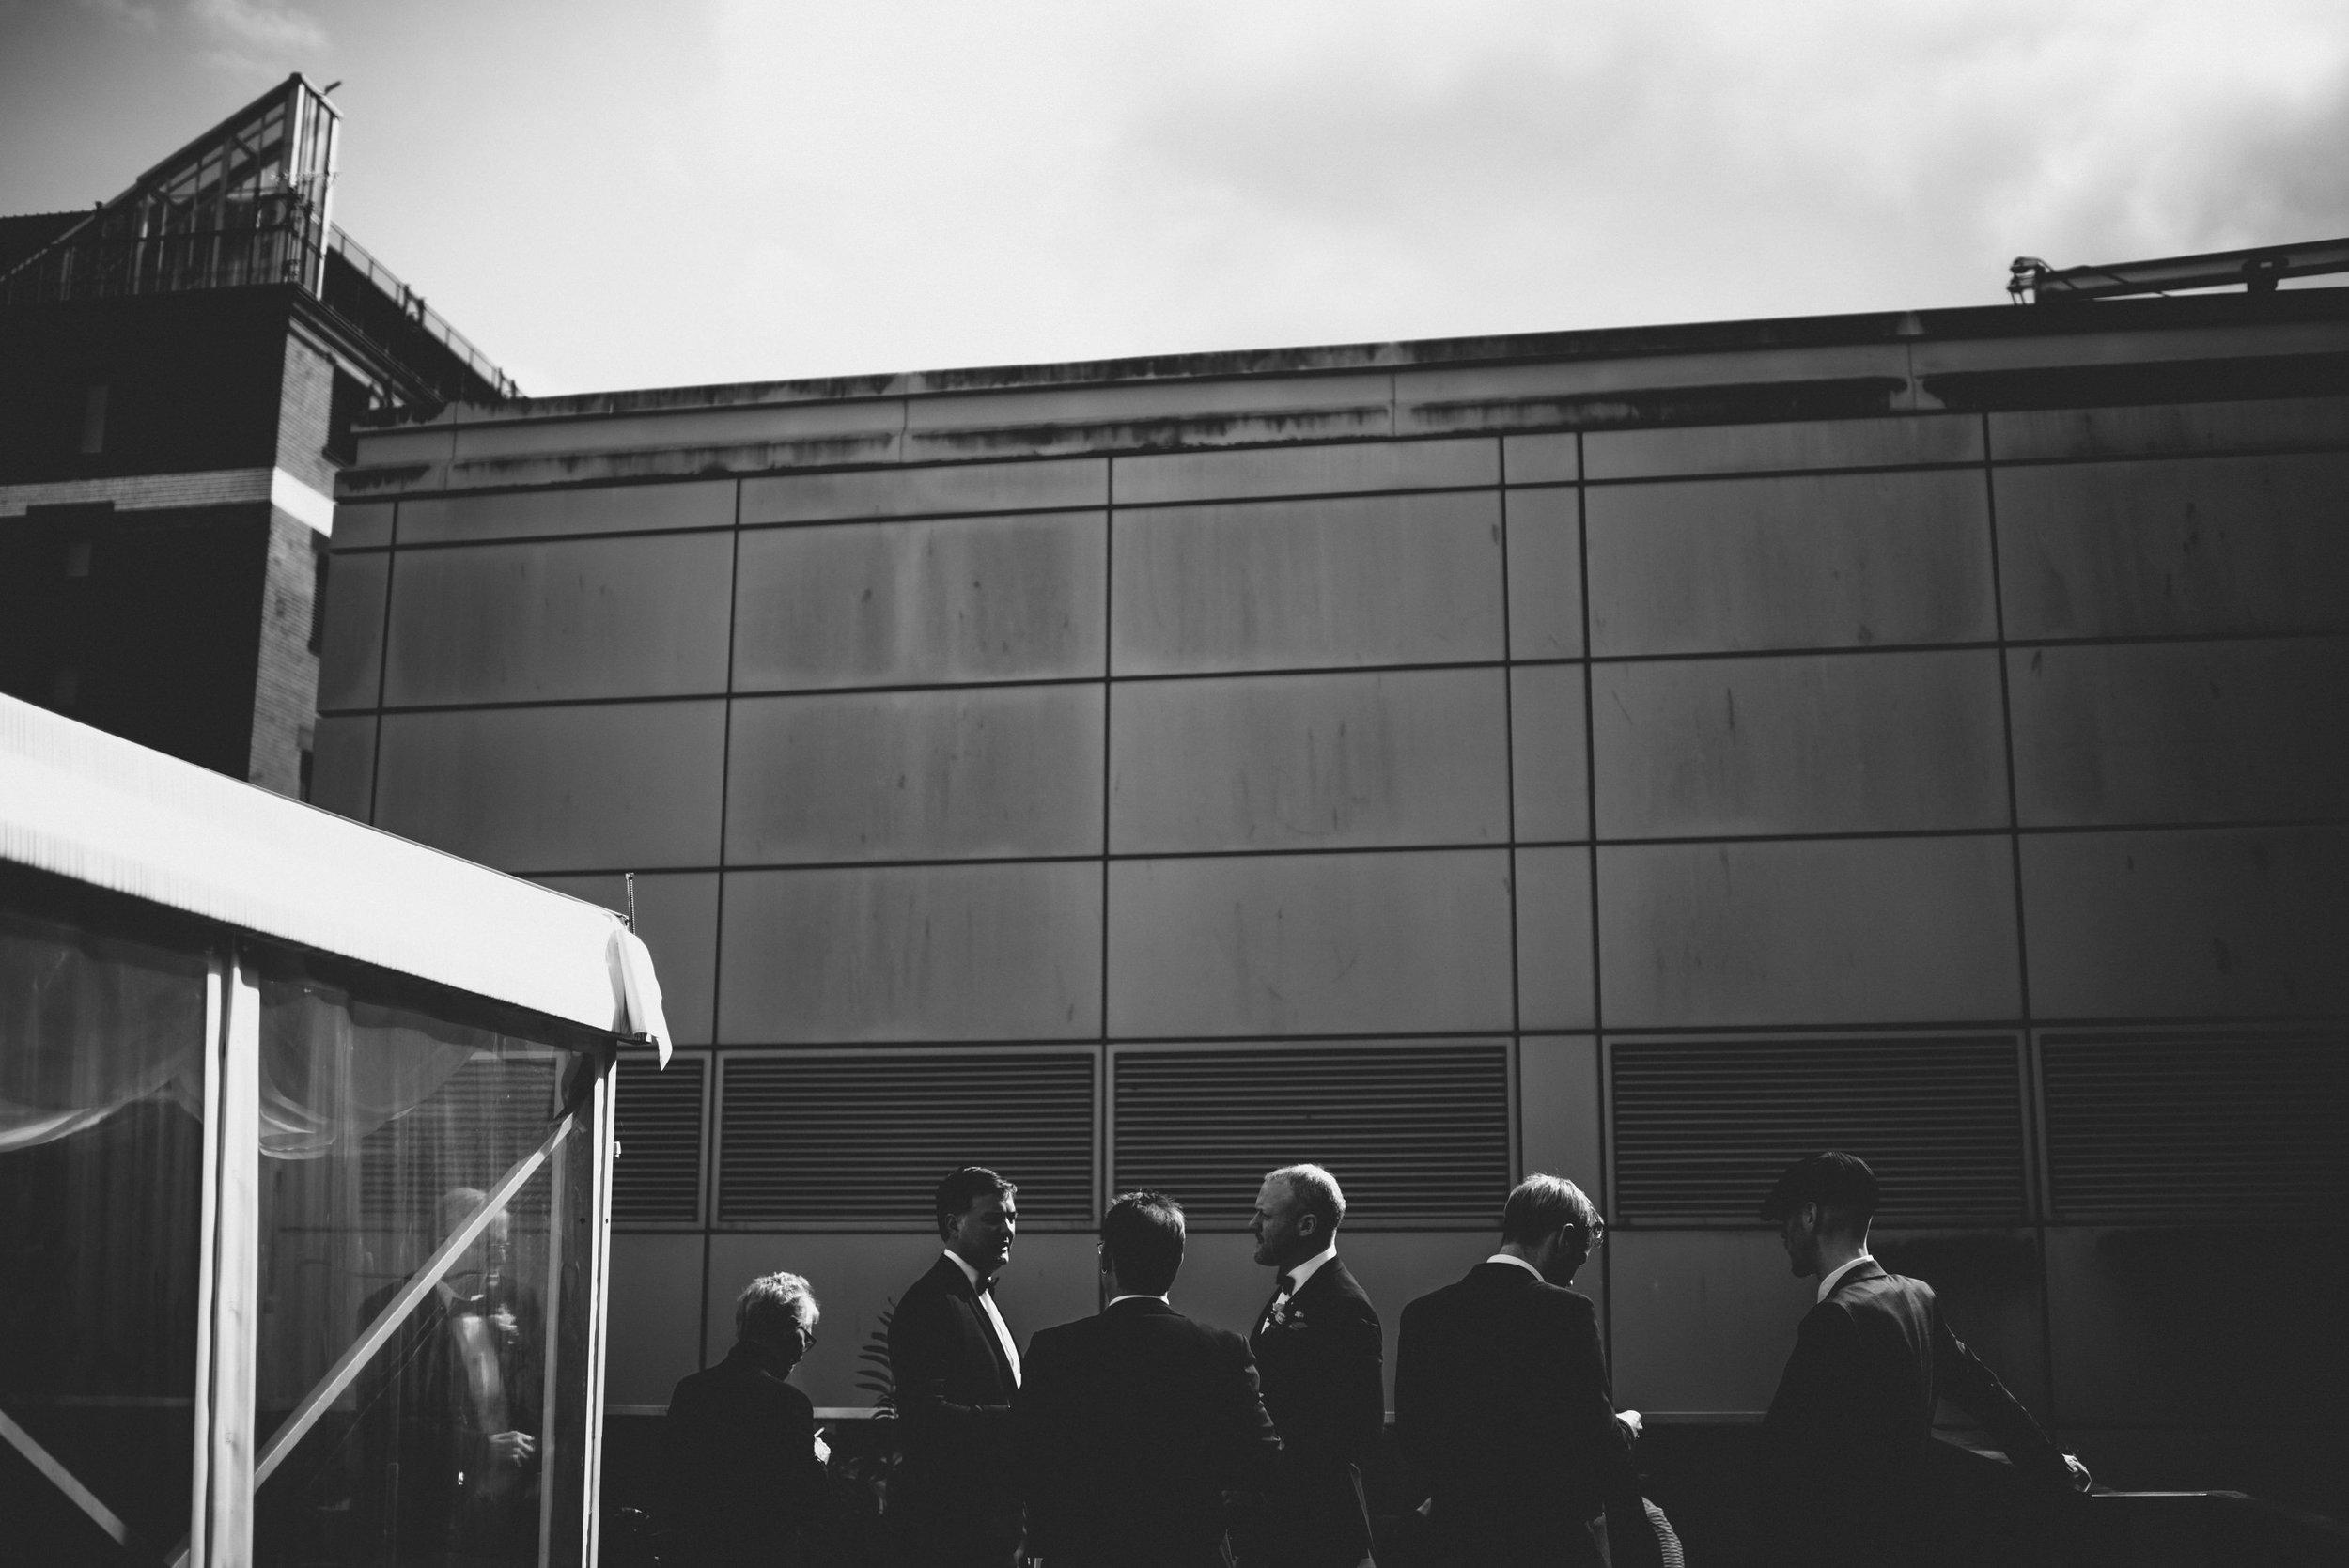 0015-LISA-DEVINE-PHOTOGRAPHY-ALTERNATIVE-WEDDING-PHOTOGRAPHY-SCOTLAND-DESTINATION-WEDDINGS-GLASGOW-WEDDINGS-COOL-WEDDINGS-STYLISH-WEDDINGS.JPG